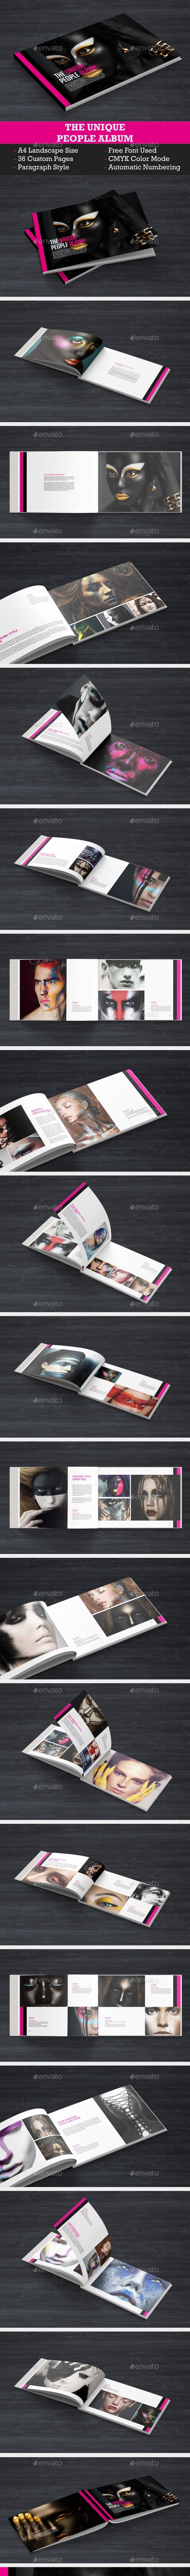 Unique Look Book - Magazines Print Templates